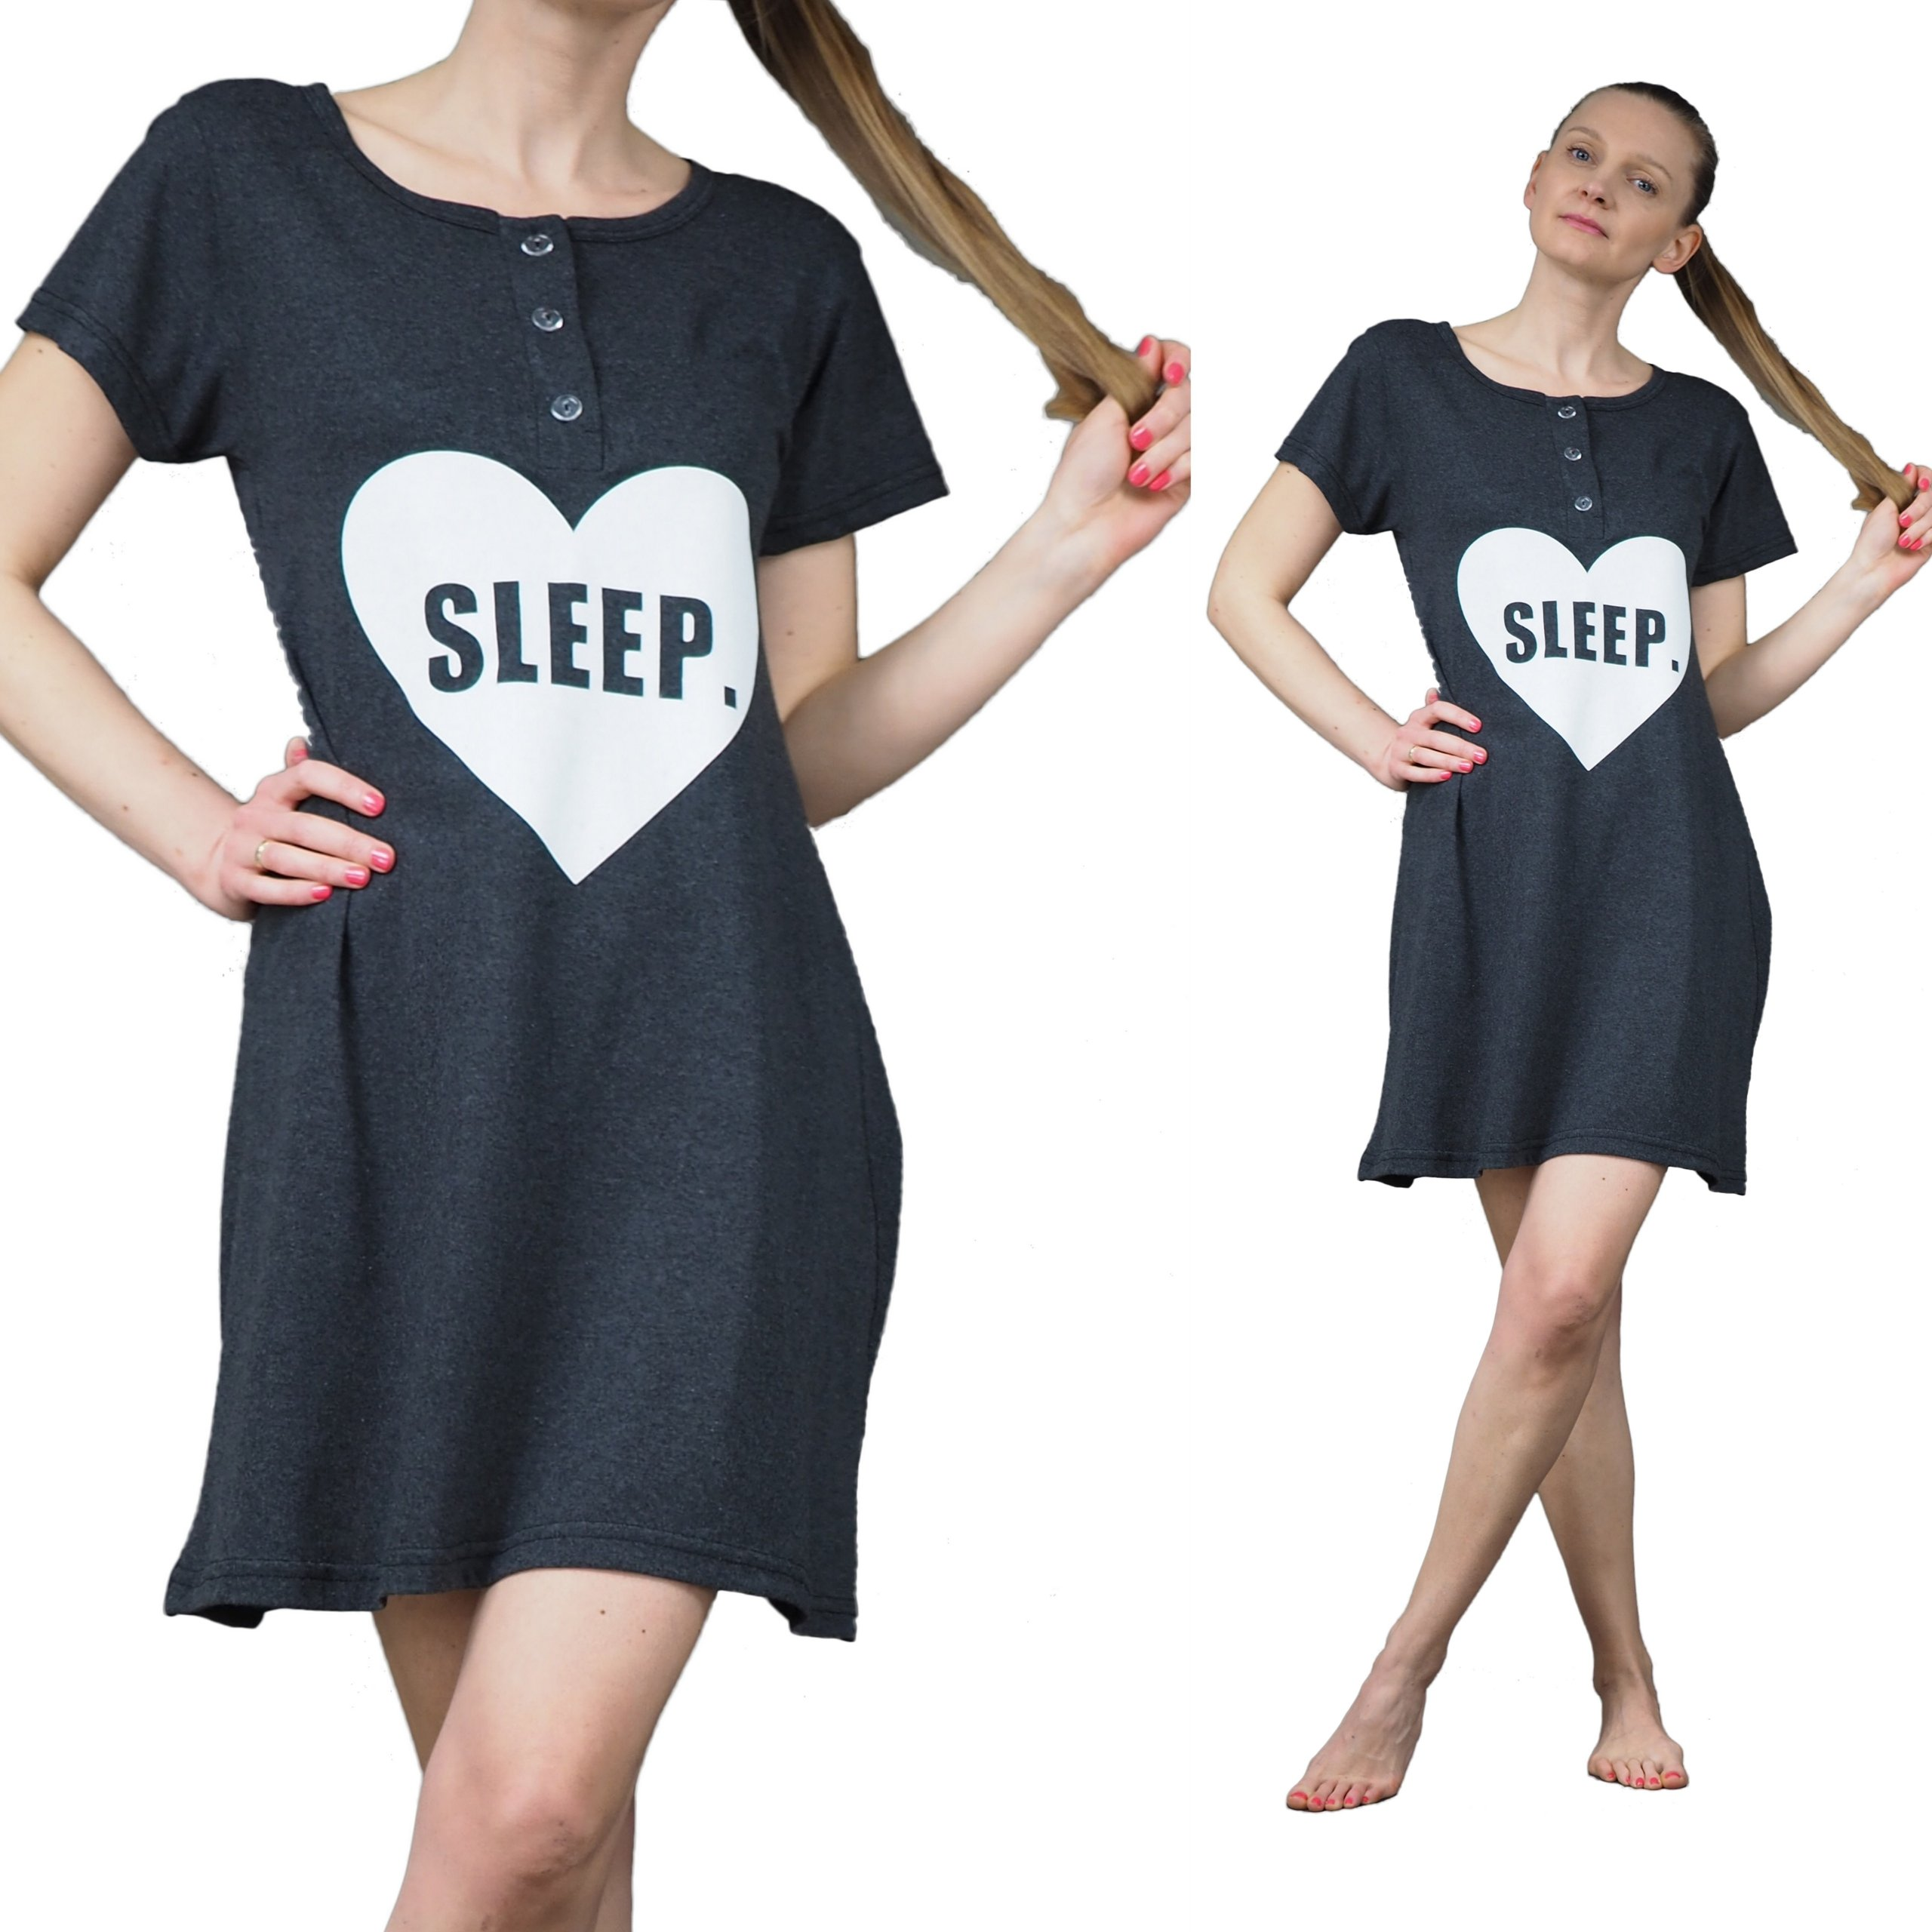 3fcb73dd6492cb KOSZULA NOCNA XL 42 piżama do szpitala s-2xl KOLOR - 6860781383 ...